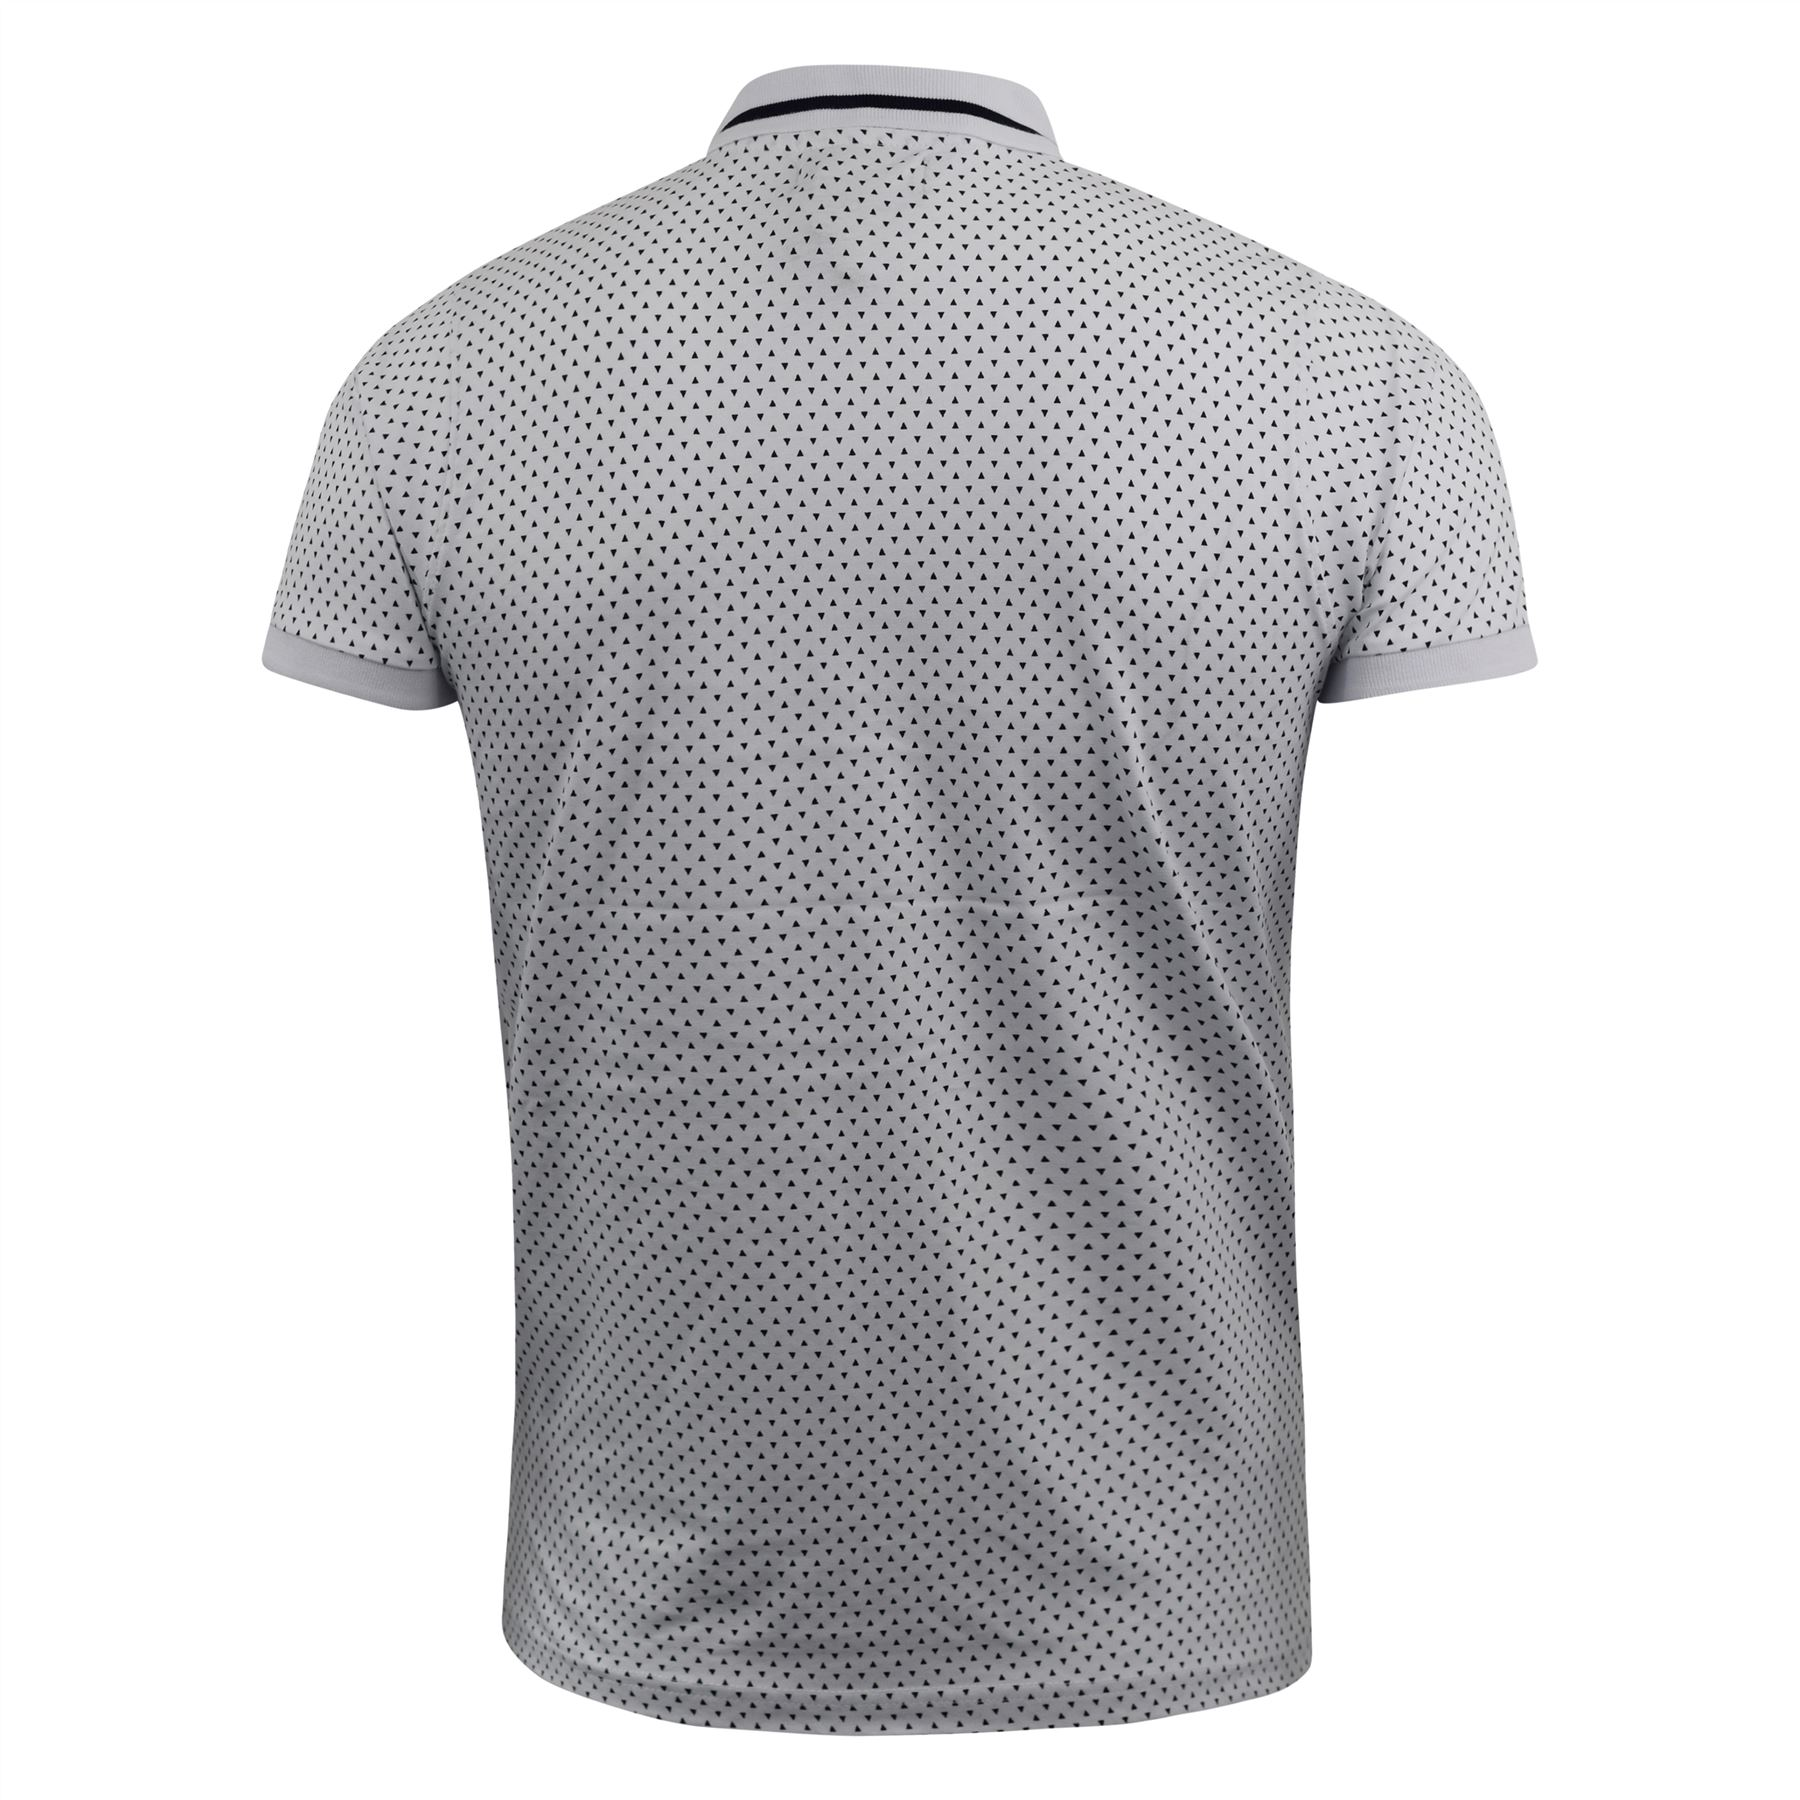 Mens-Polo-Shirt-kangol-Short-Sleeve-T-Shirt-Top-Saint thumbnail 7